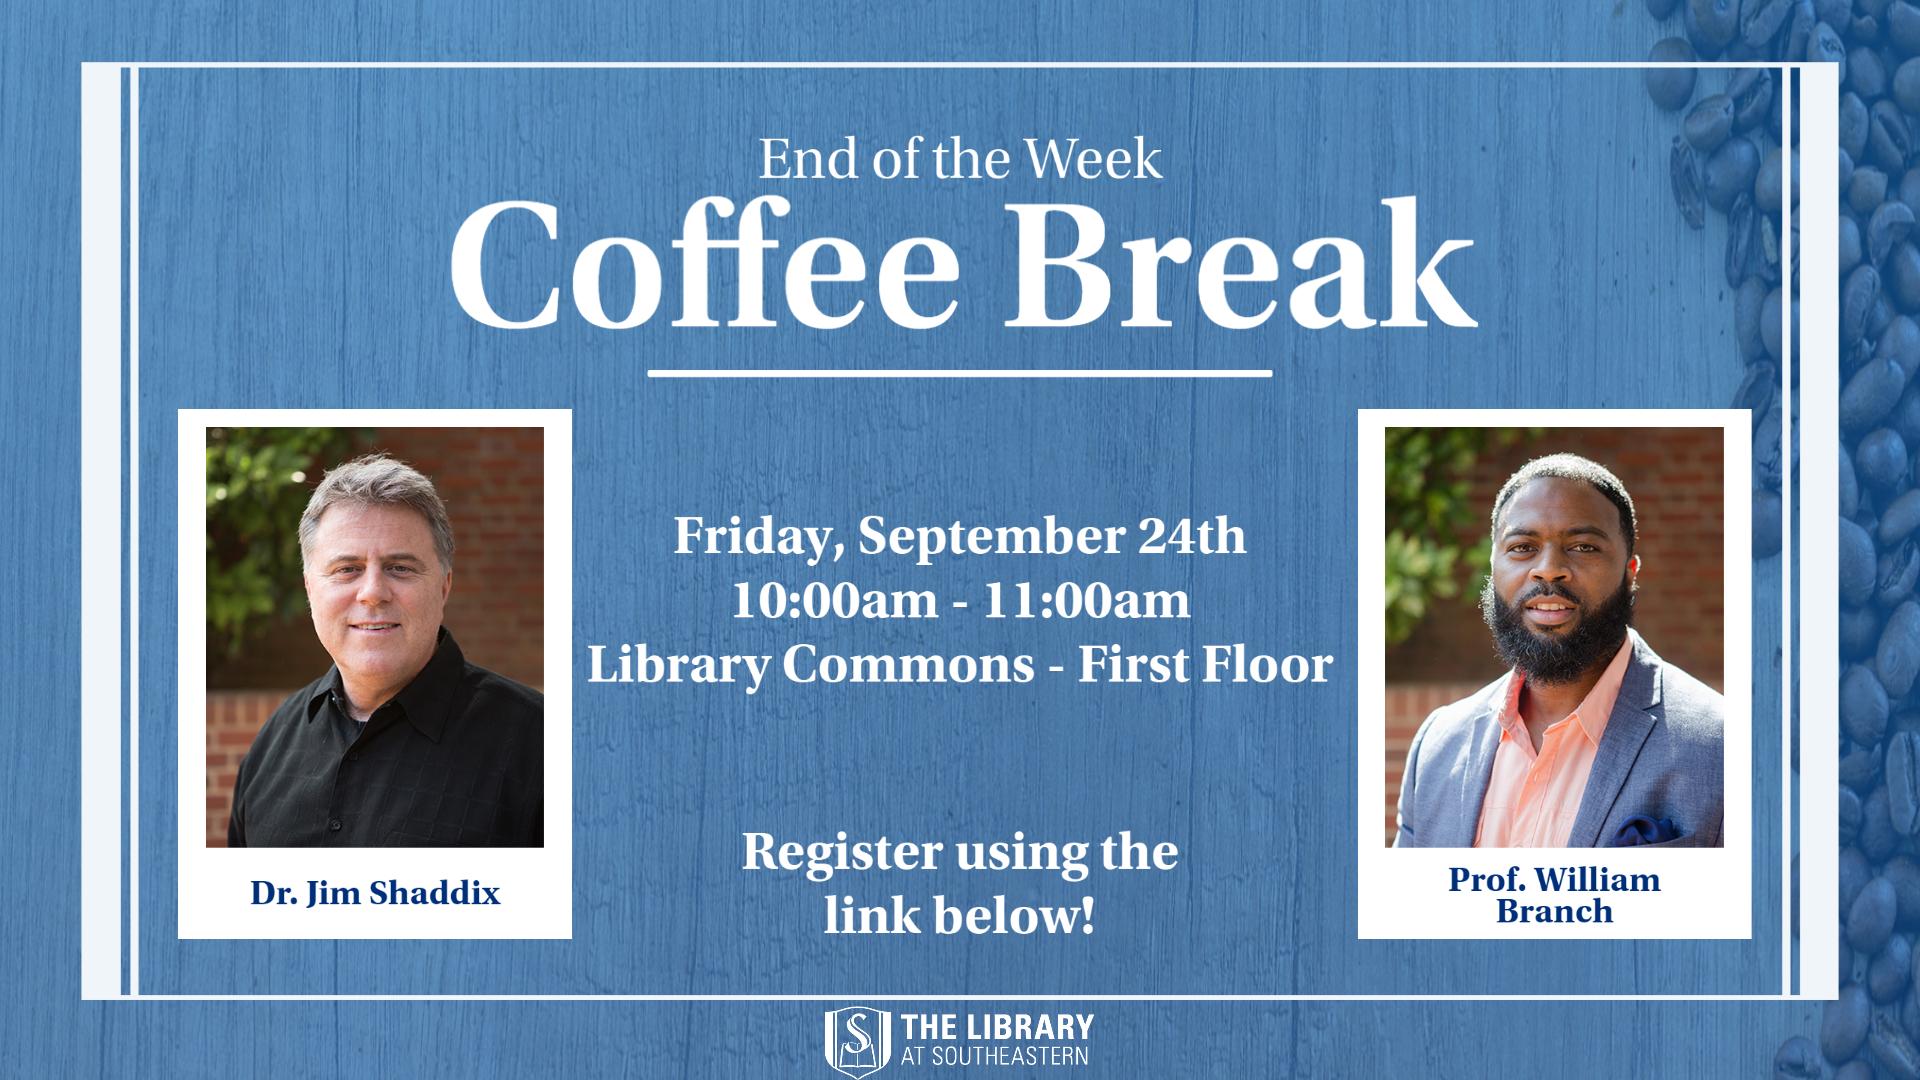 Coffee Break with Dr. Jim Shaddix